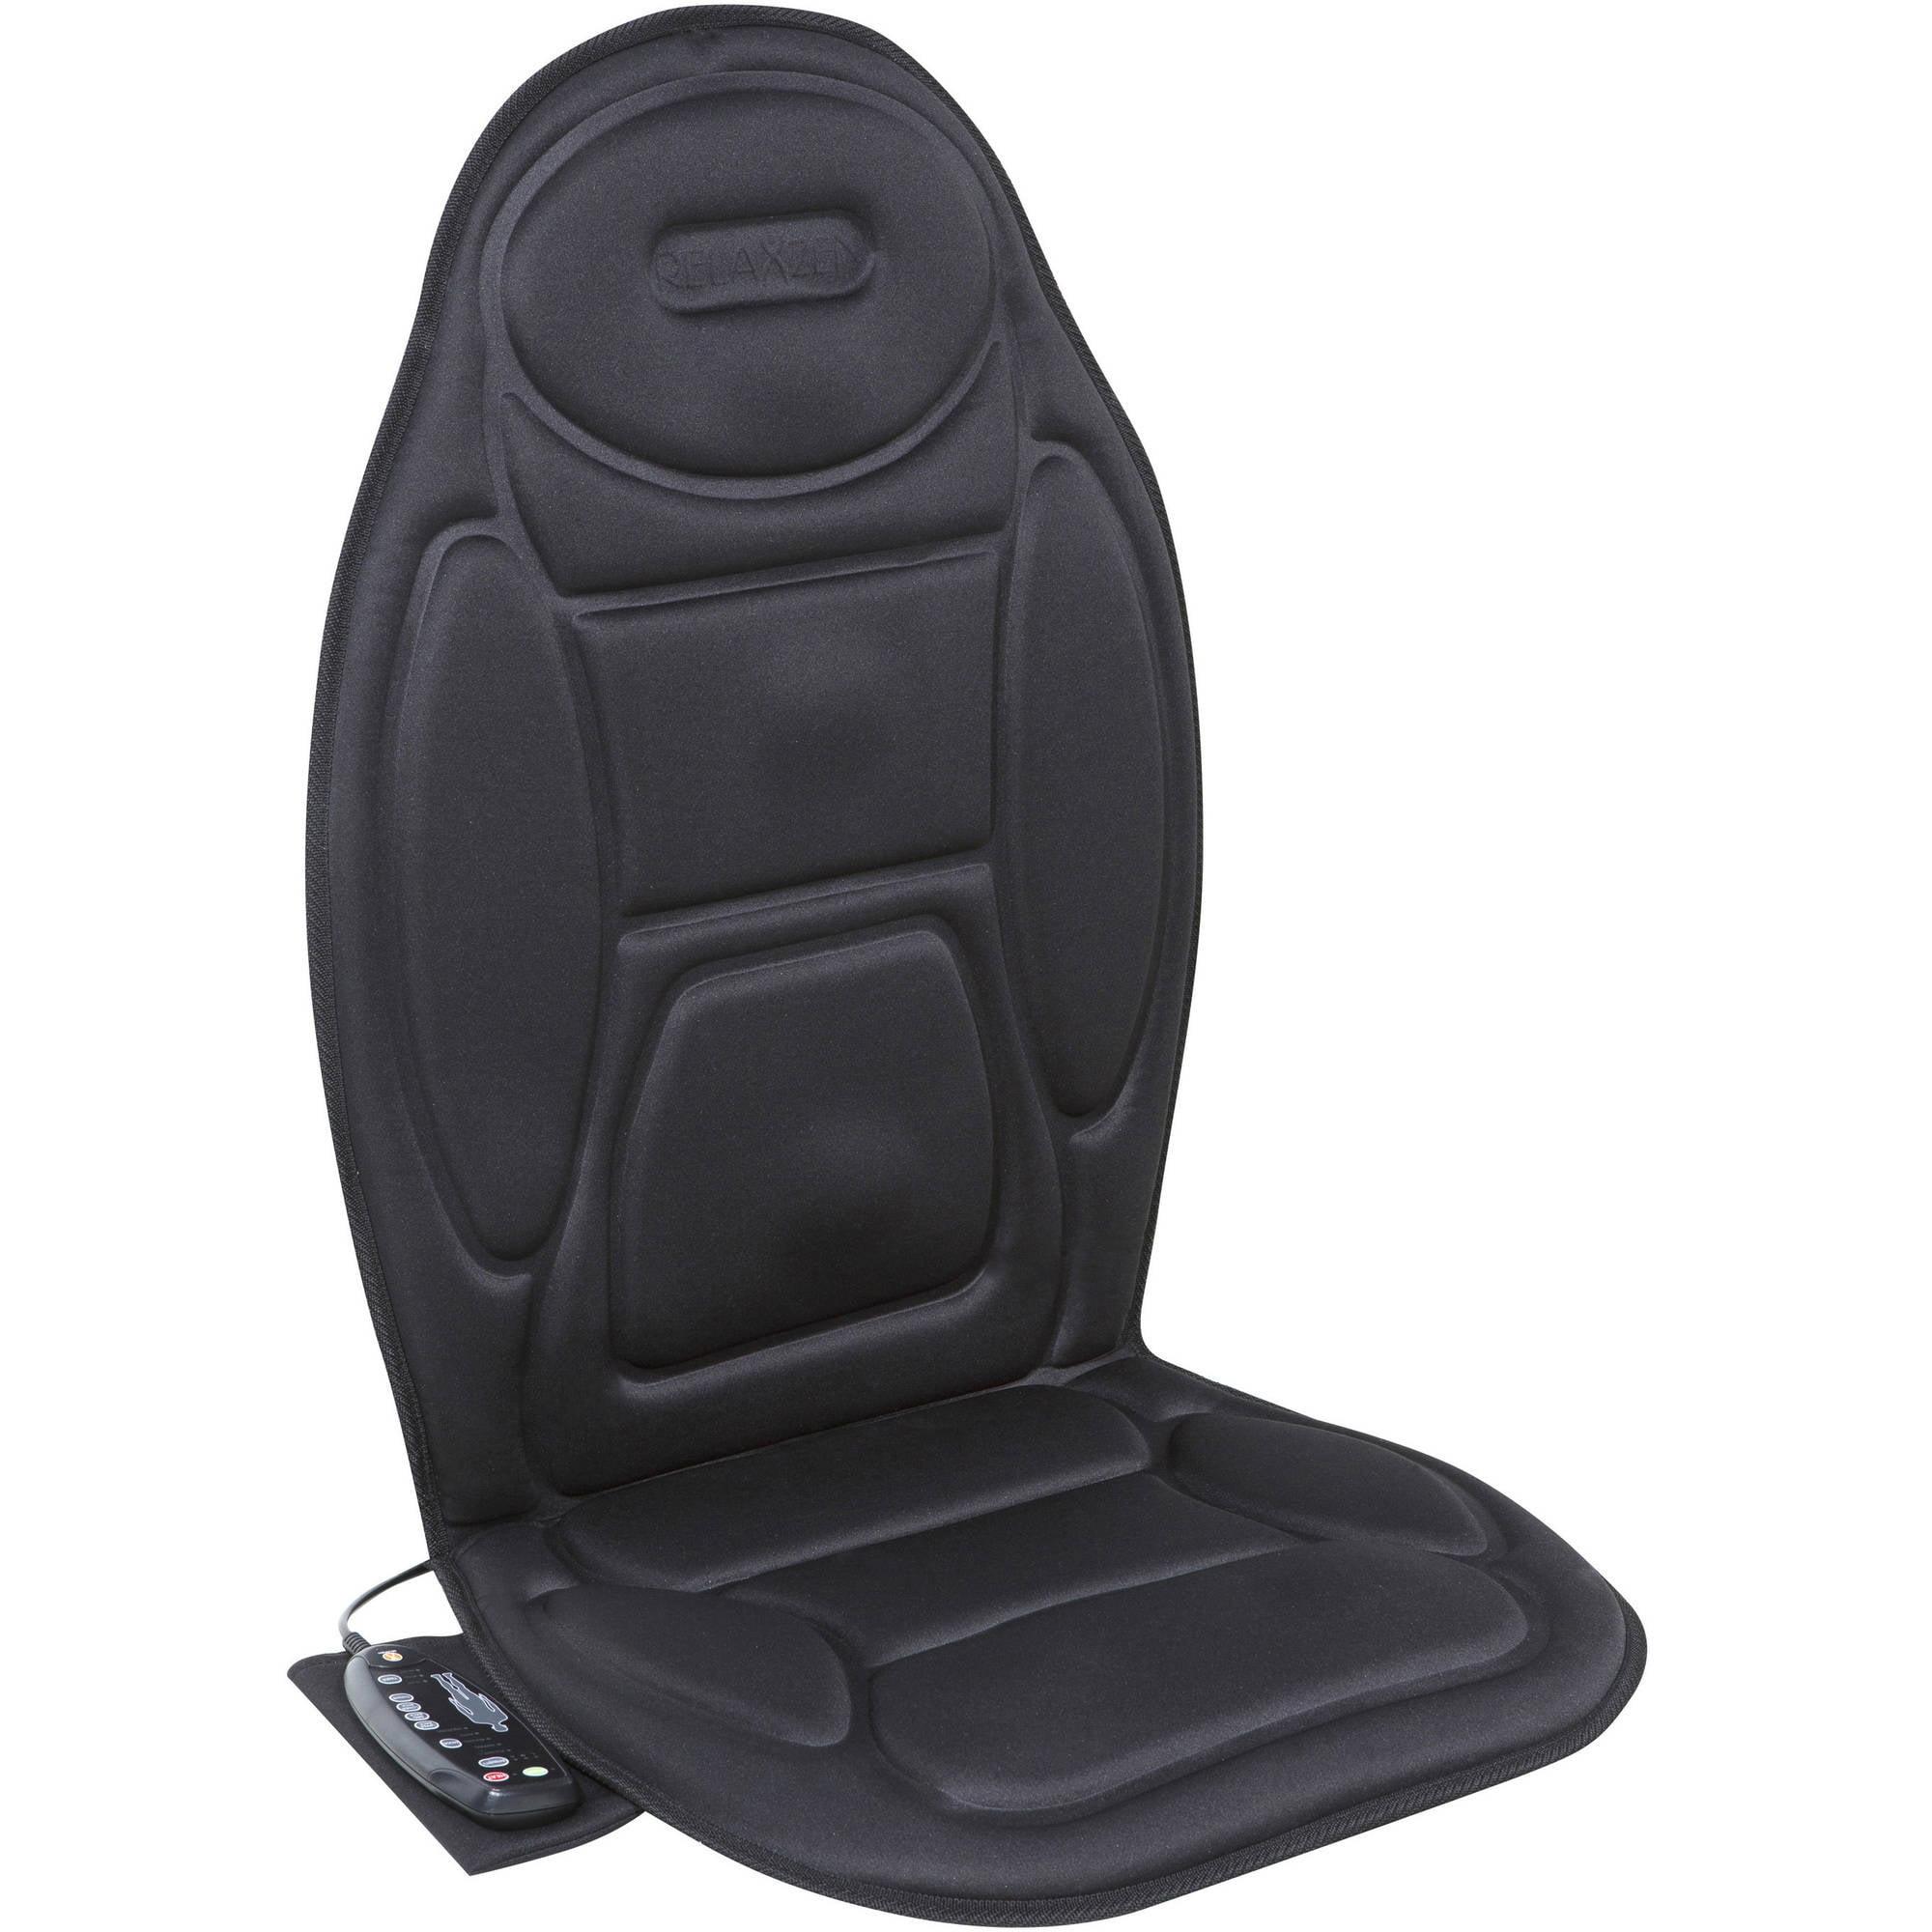 Relaxzen 60-2926XP Massage Seat Cushion, Black